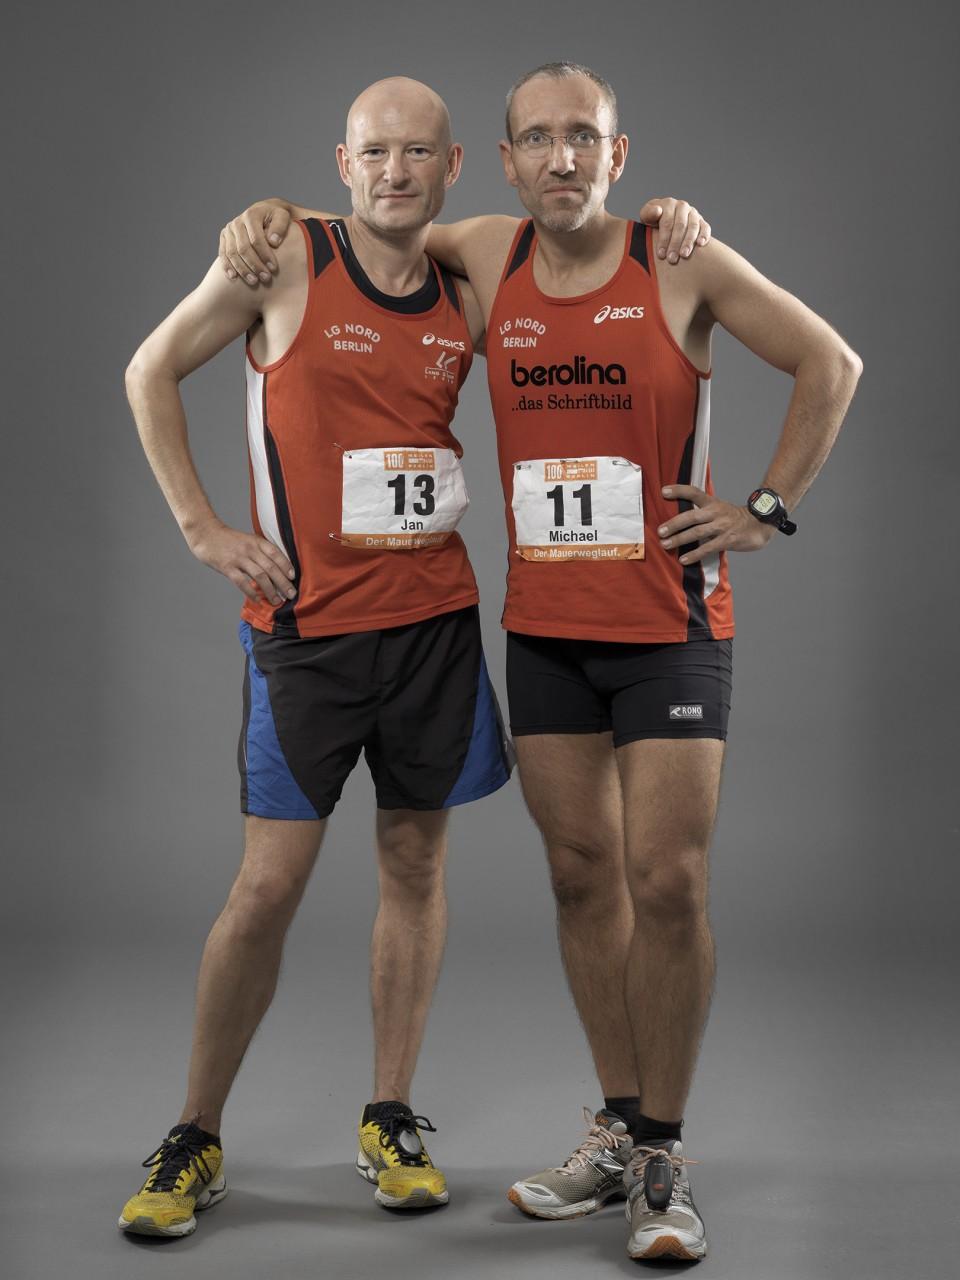 Jan Prochaska und Michael Vanicek: 16 Std. 22 Min.